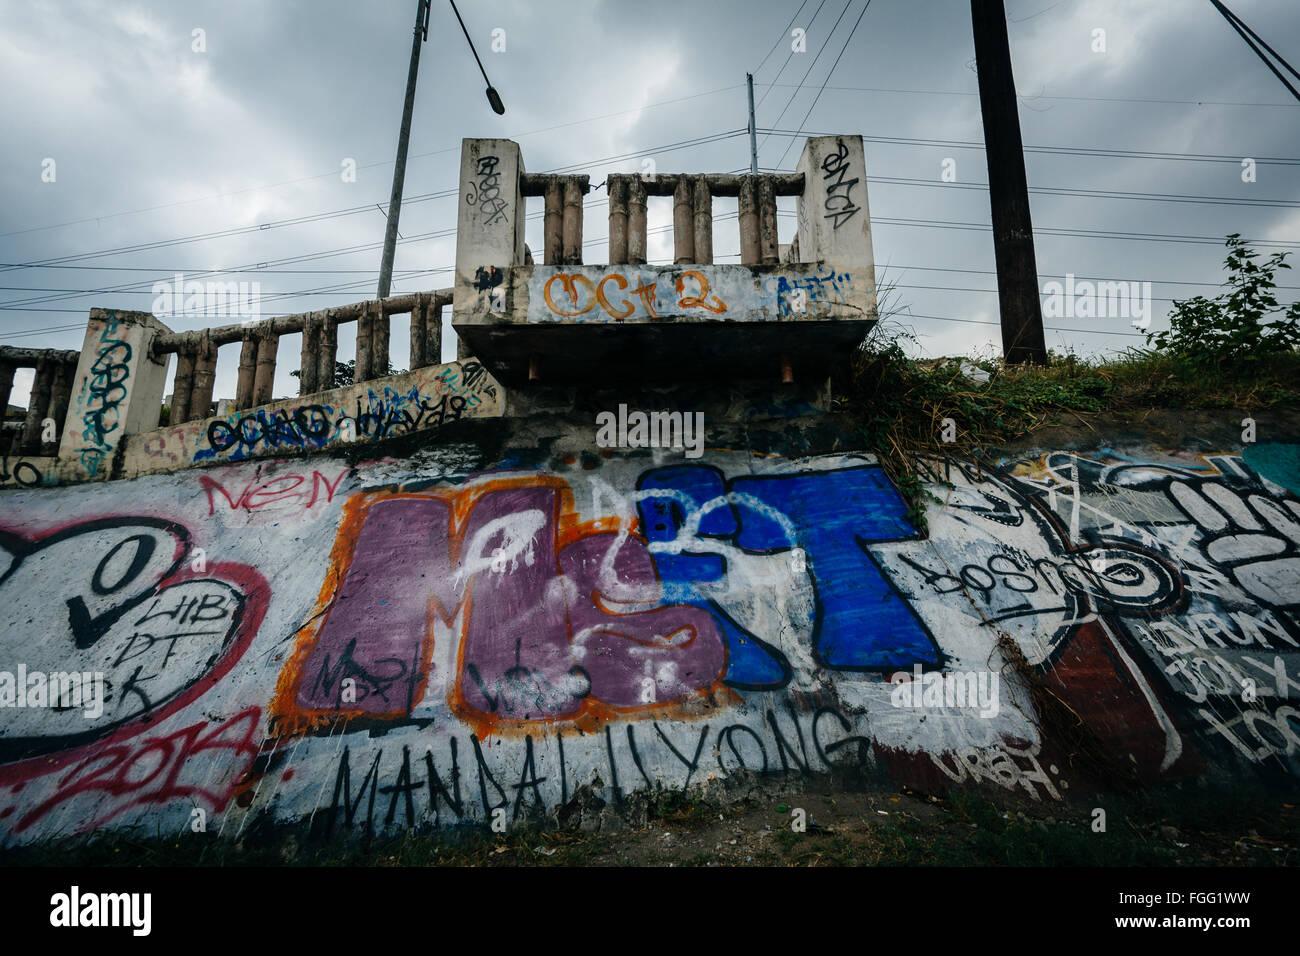 Graffiti along the Pasig River, in Makati, Metro Manila, The Philippines. - Stock Image